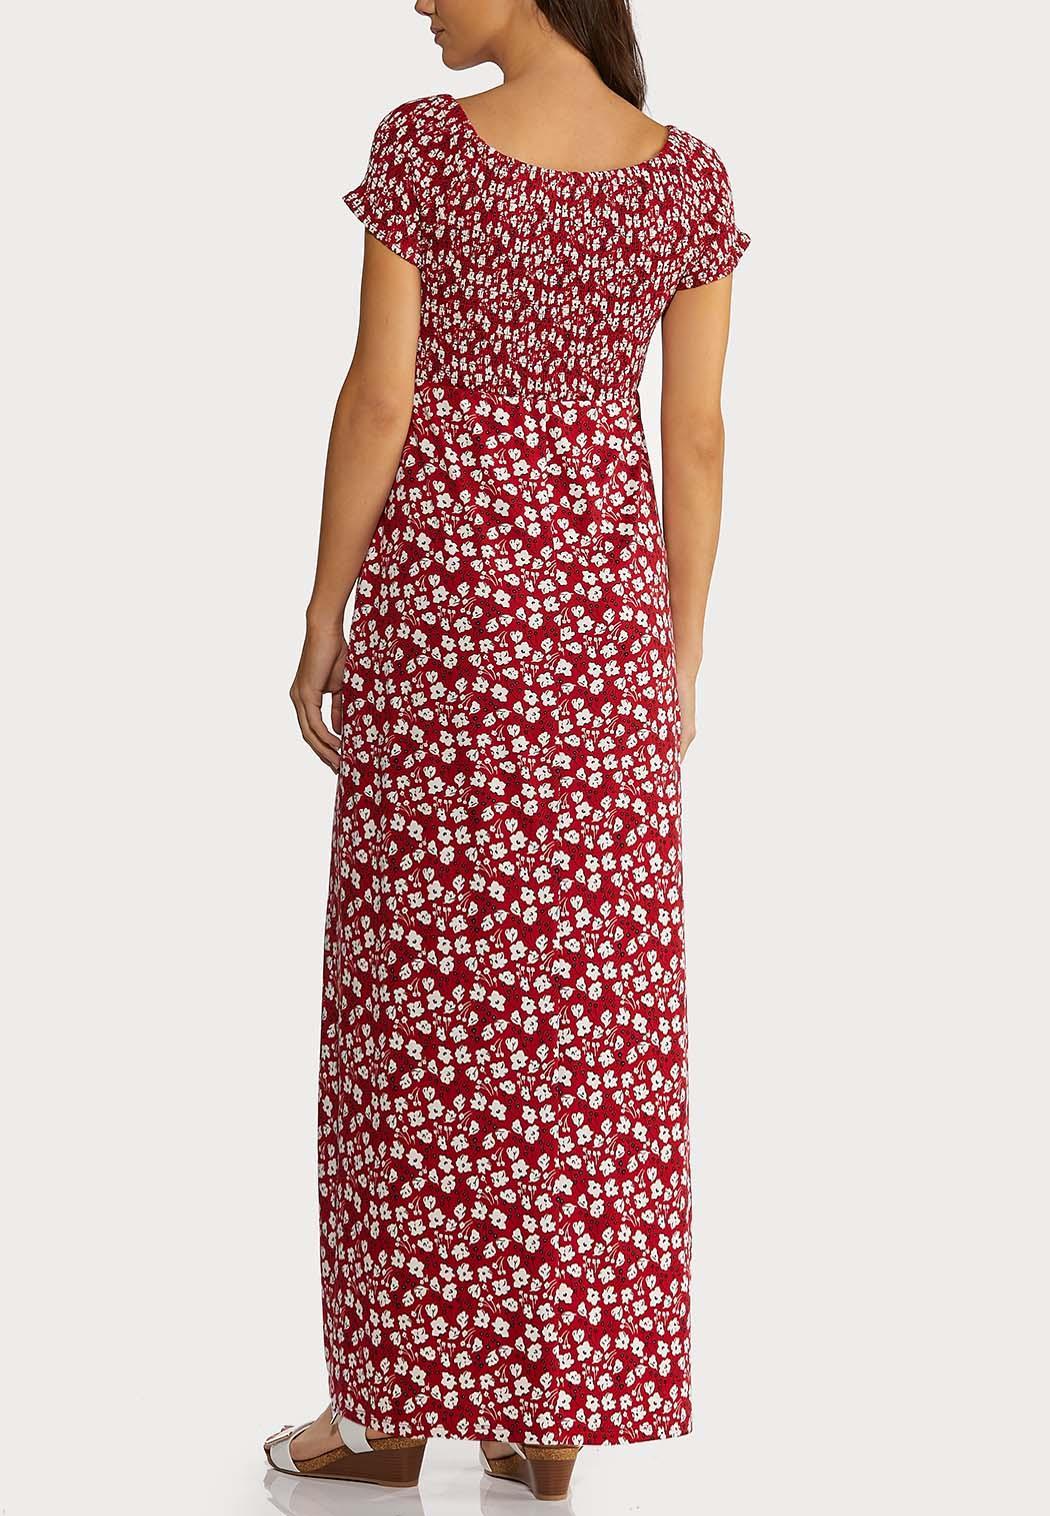 Plus Petite Smocked Floral Maxi Dress (Item #44194673)